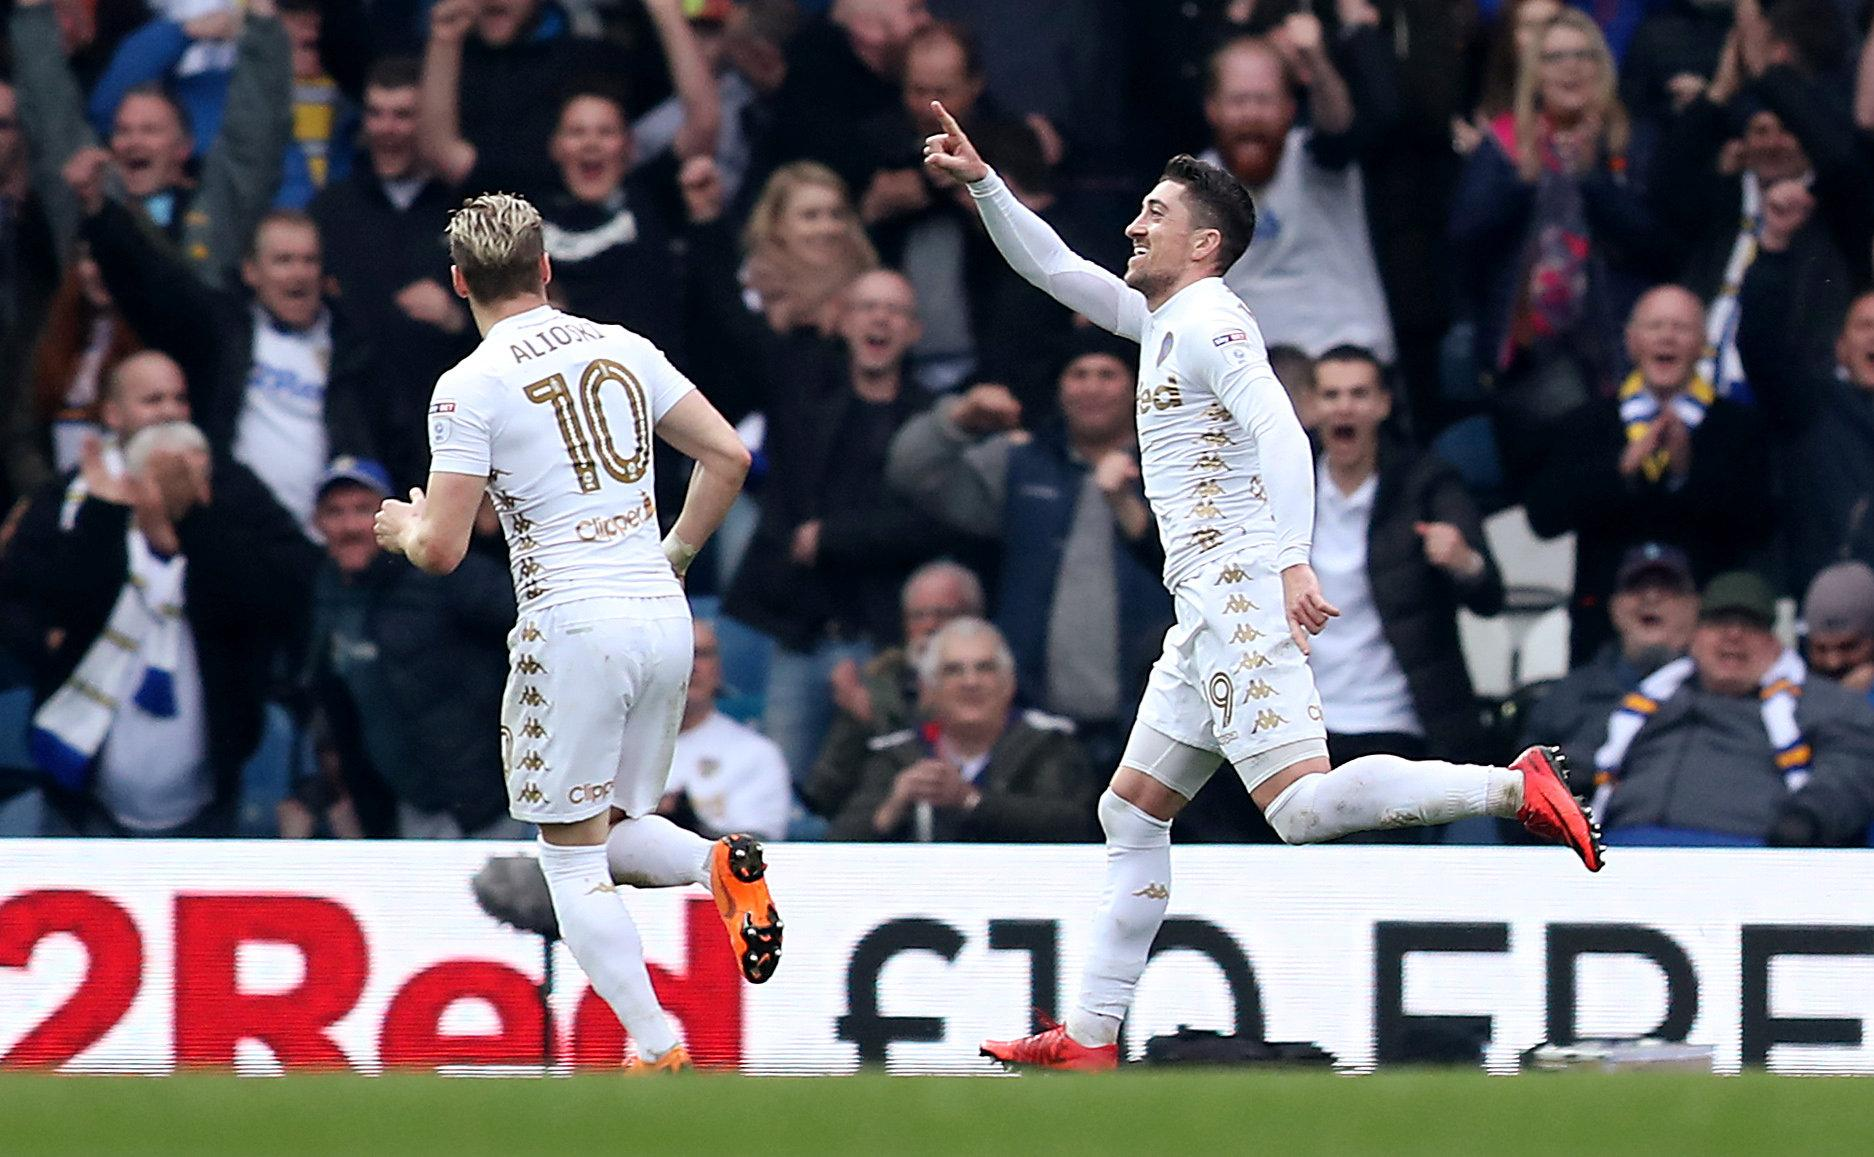 Pablo Hernandez grabs a point for Leeds United